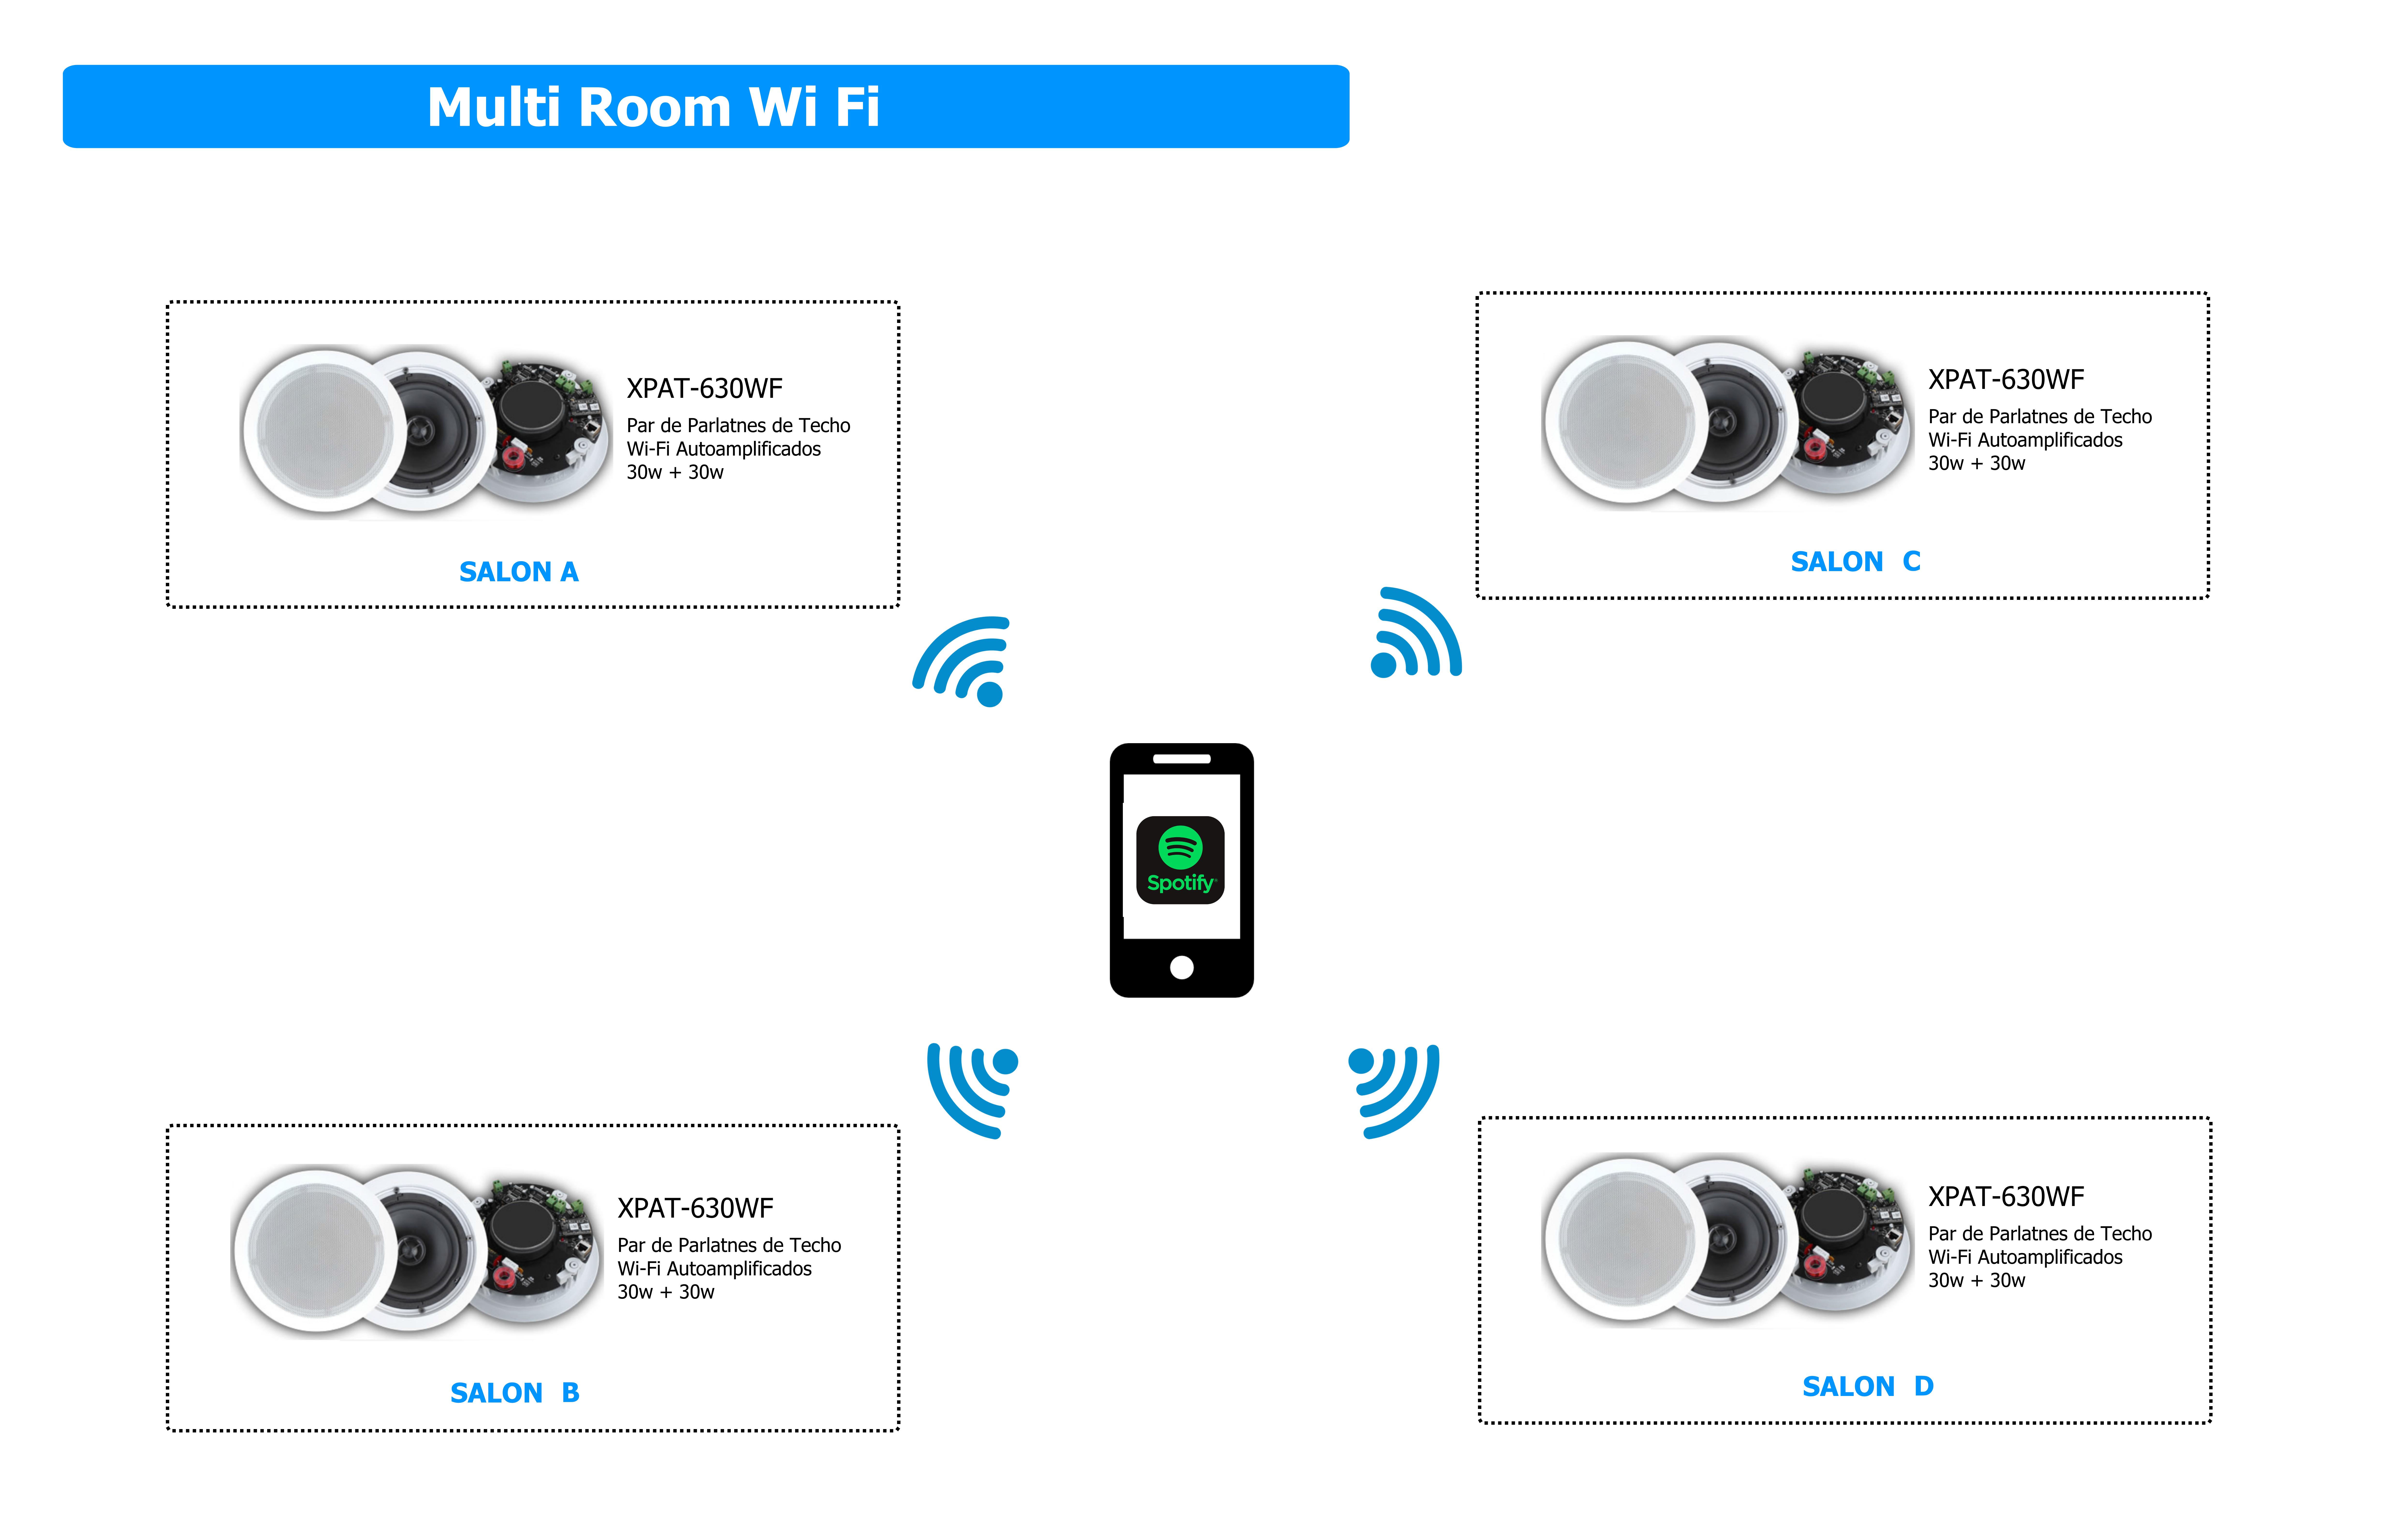 multiroom-xpat630wf.png